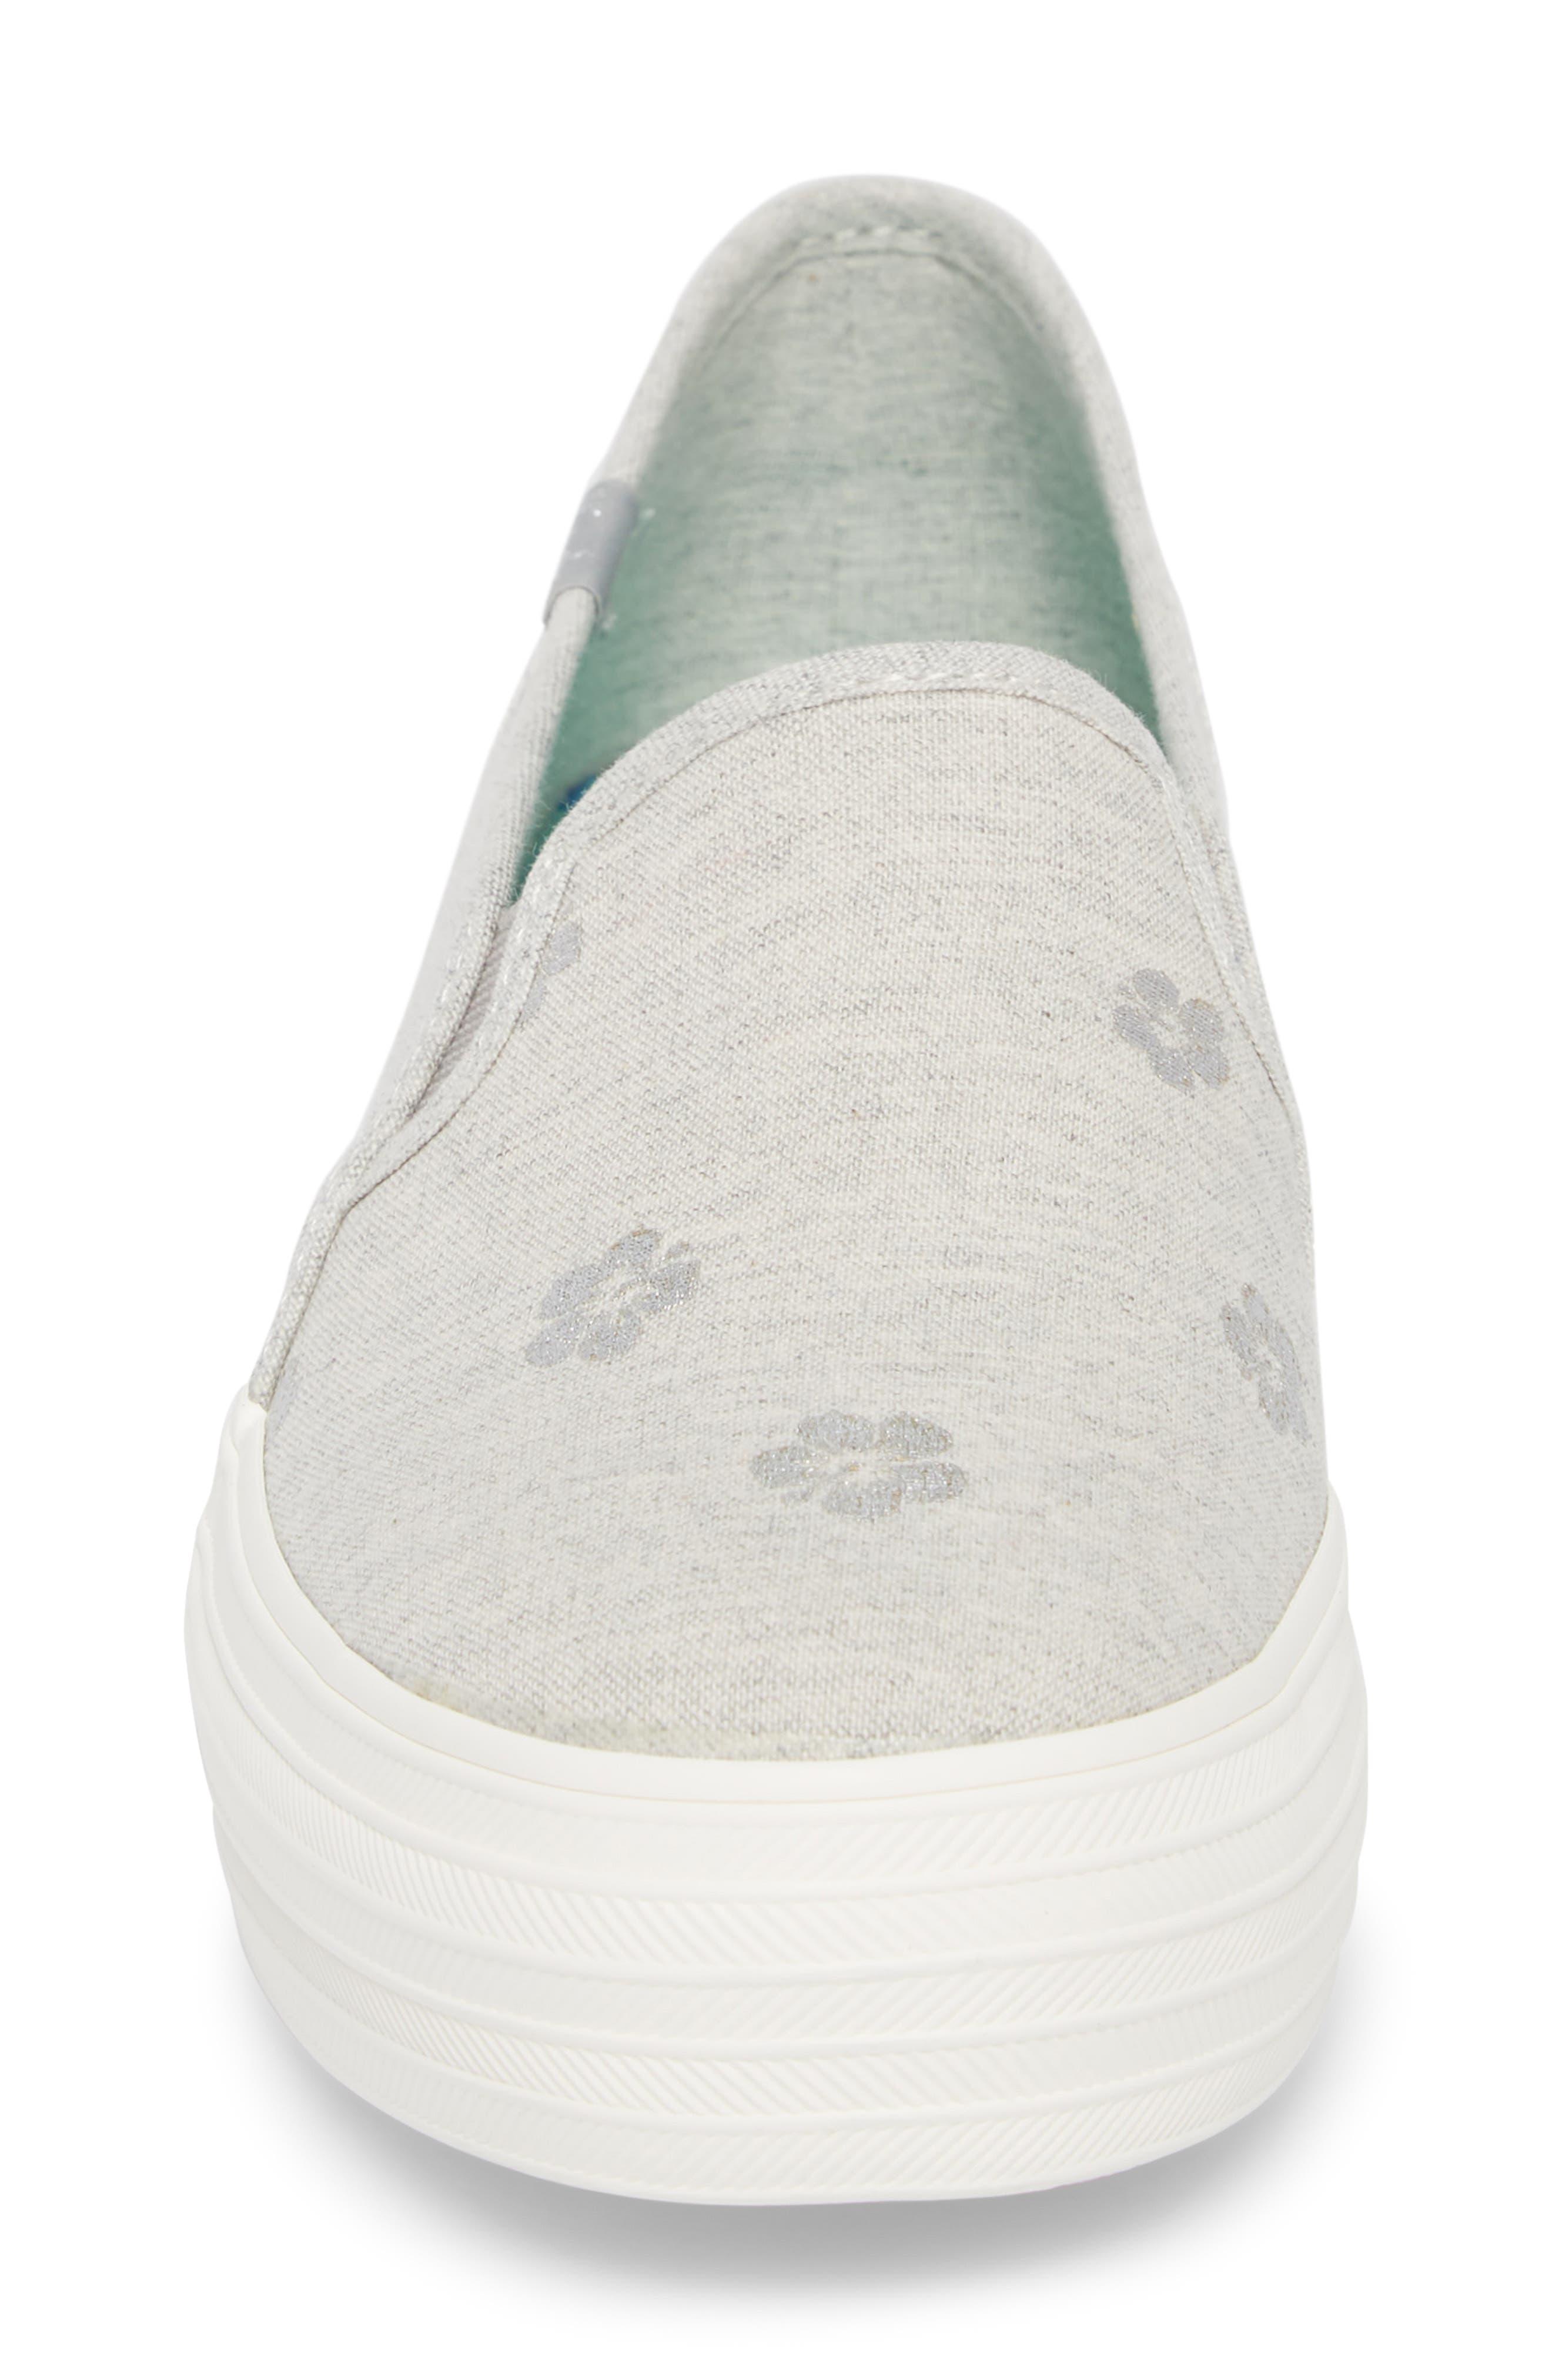 Triple Decker Hibiscus Slip-On Platform Sneaker,                             Alternate thumbnail 4, color,                             Light Grey